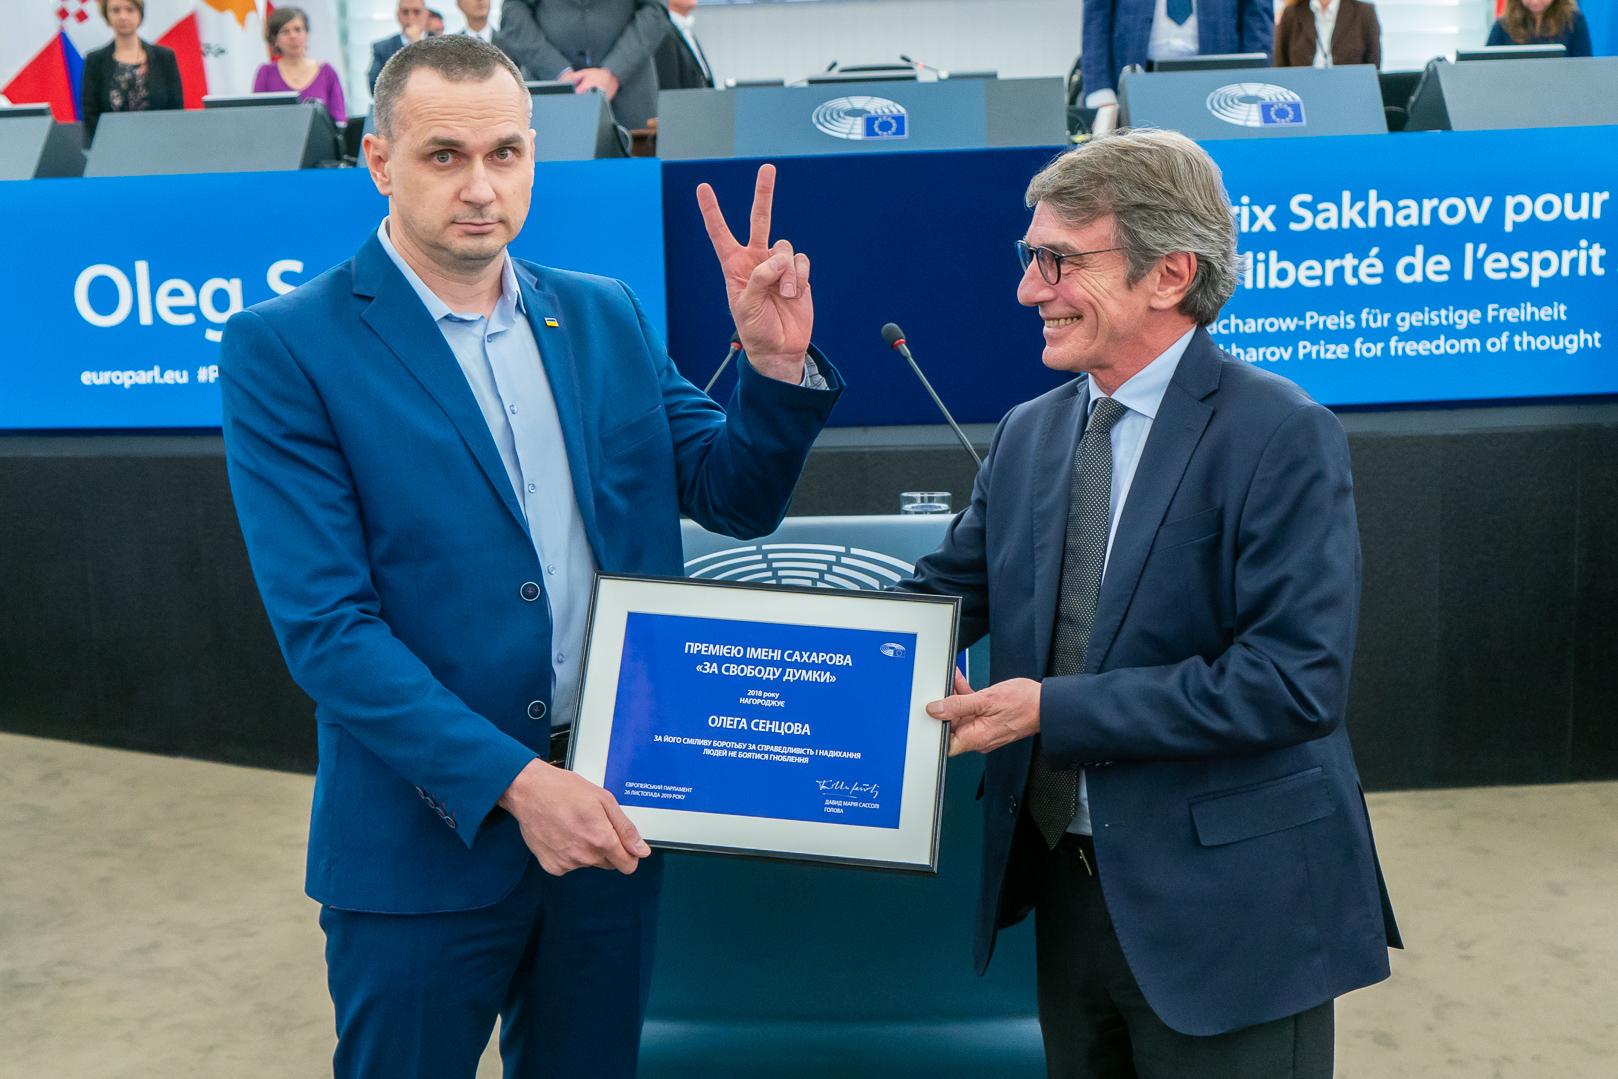 Le prix Sakharov pour Oleg Sentsov